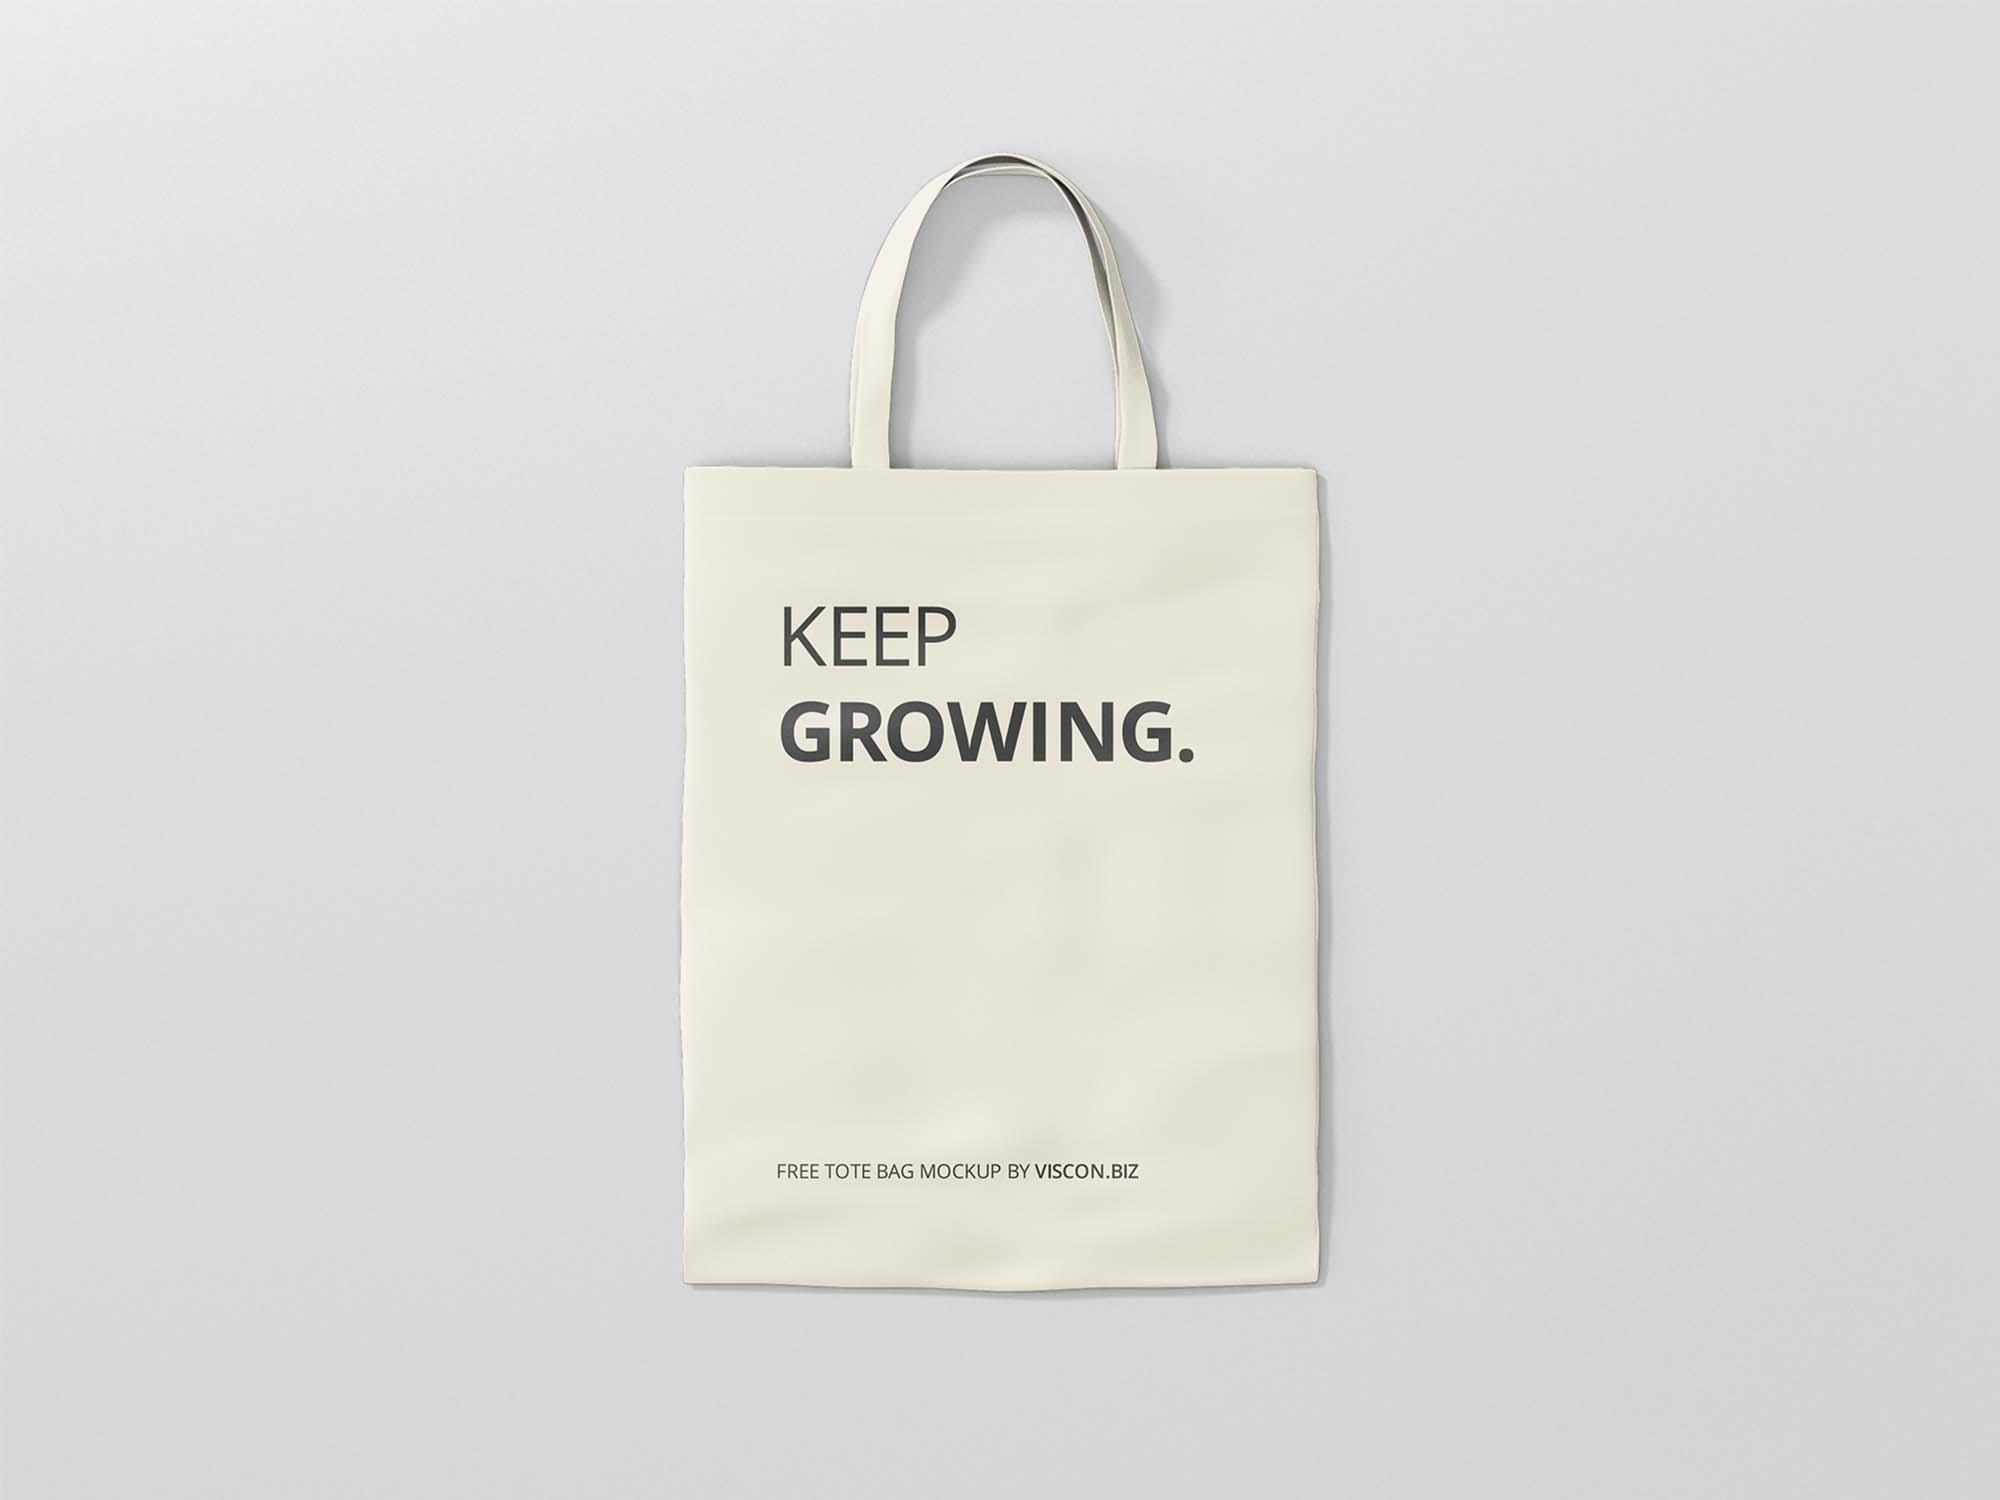 An elegant psd tote bag mockup to showcase any branding designs. Free Tote Bag Mockup Psd